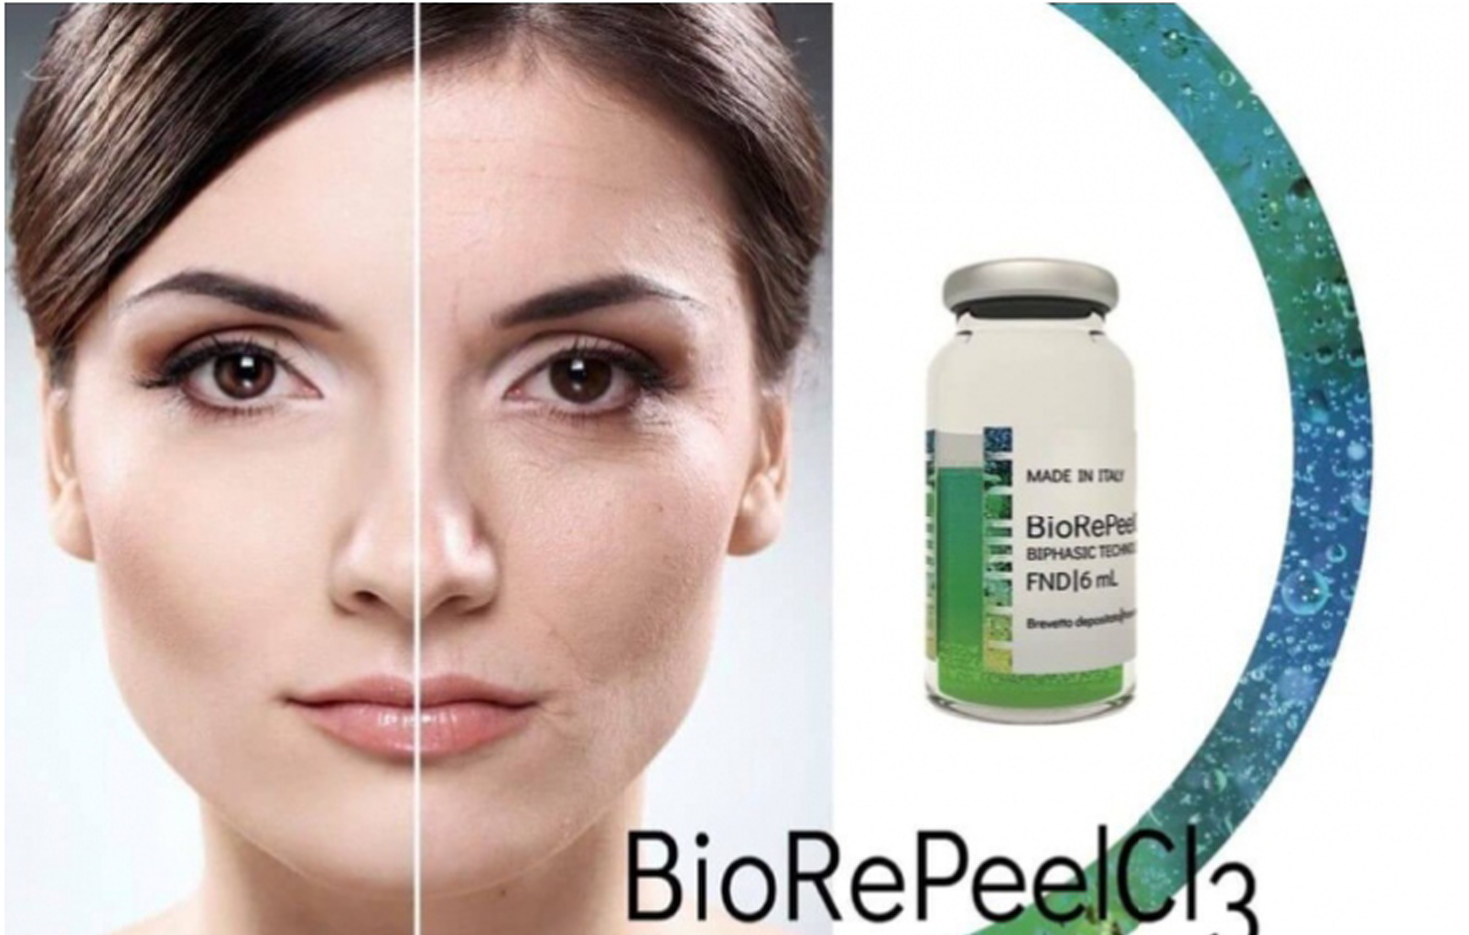 BioRePeelCI3